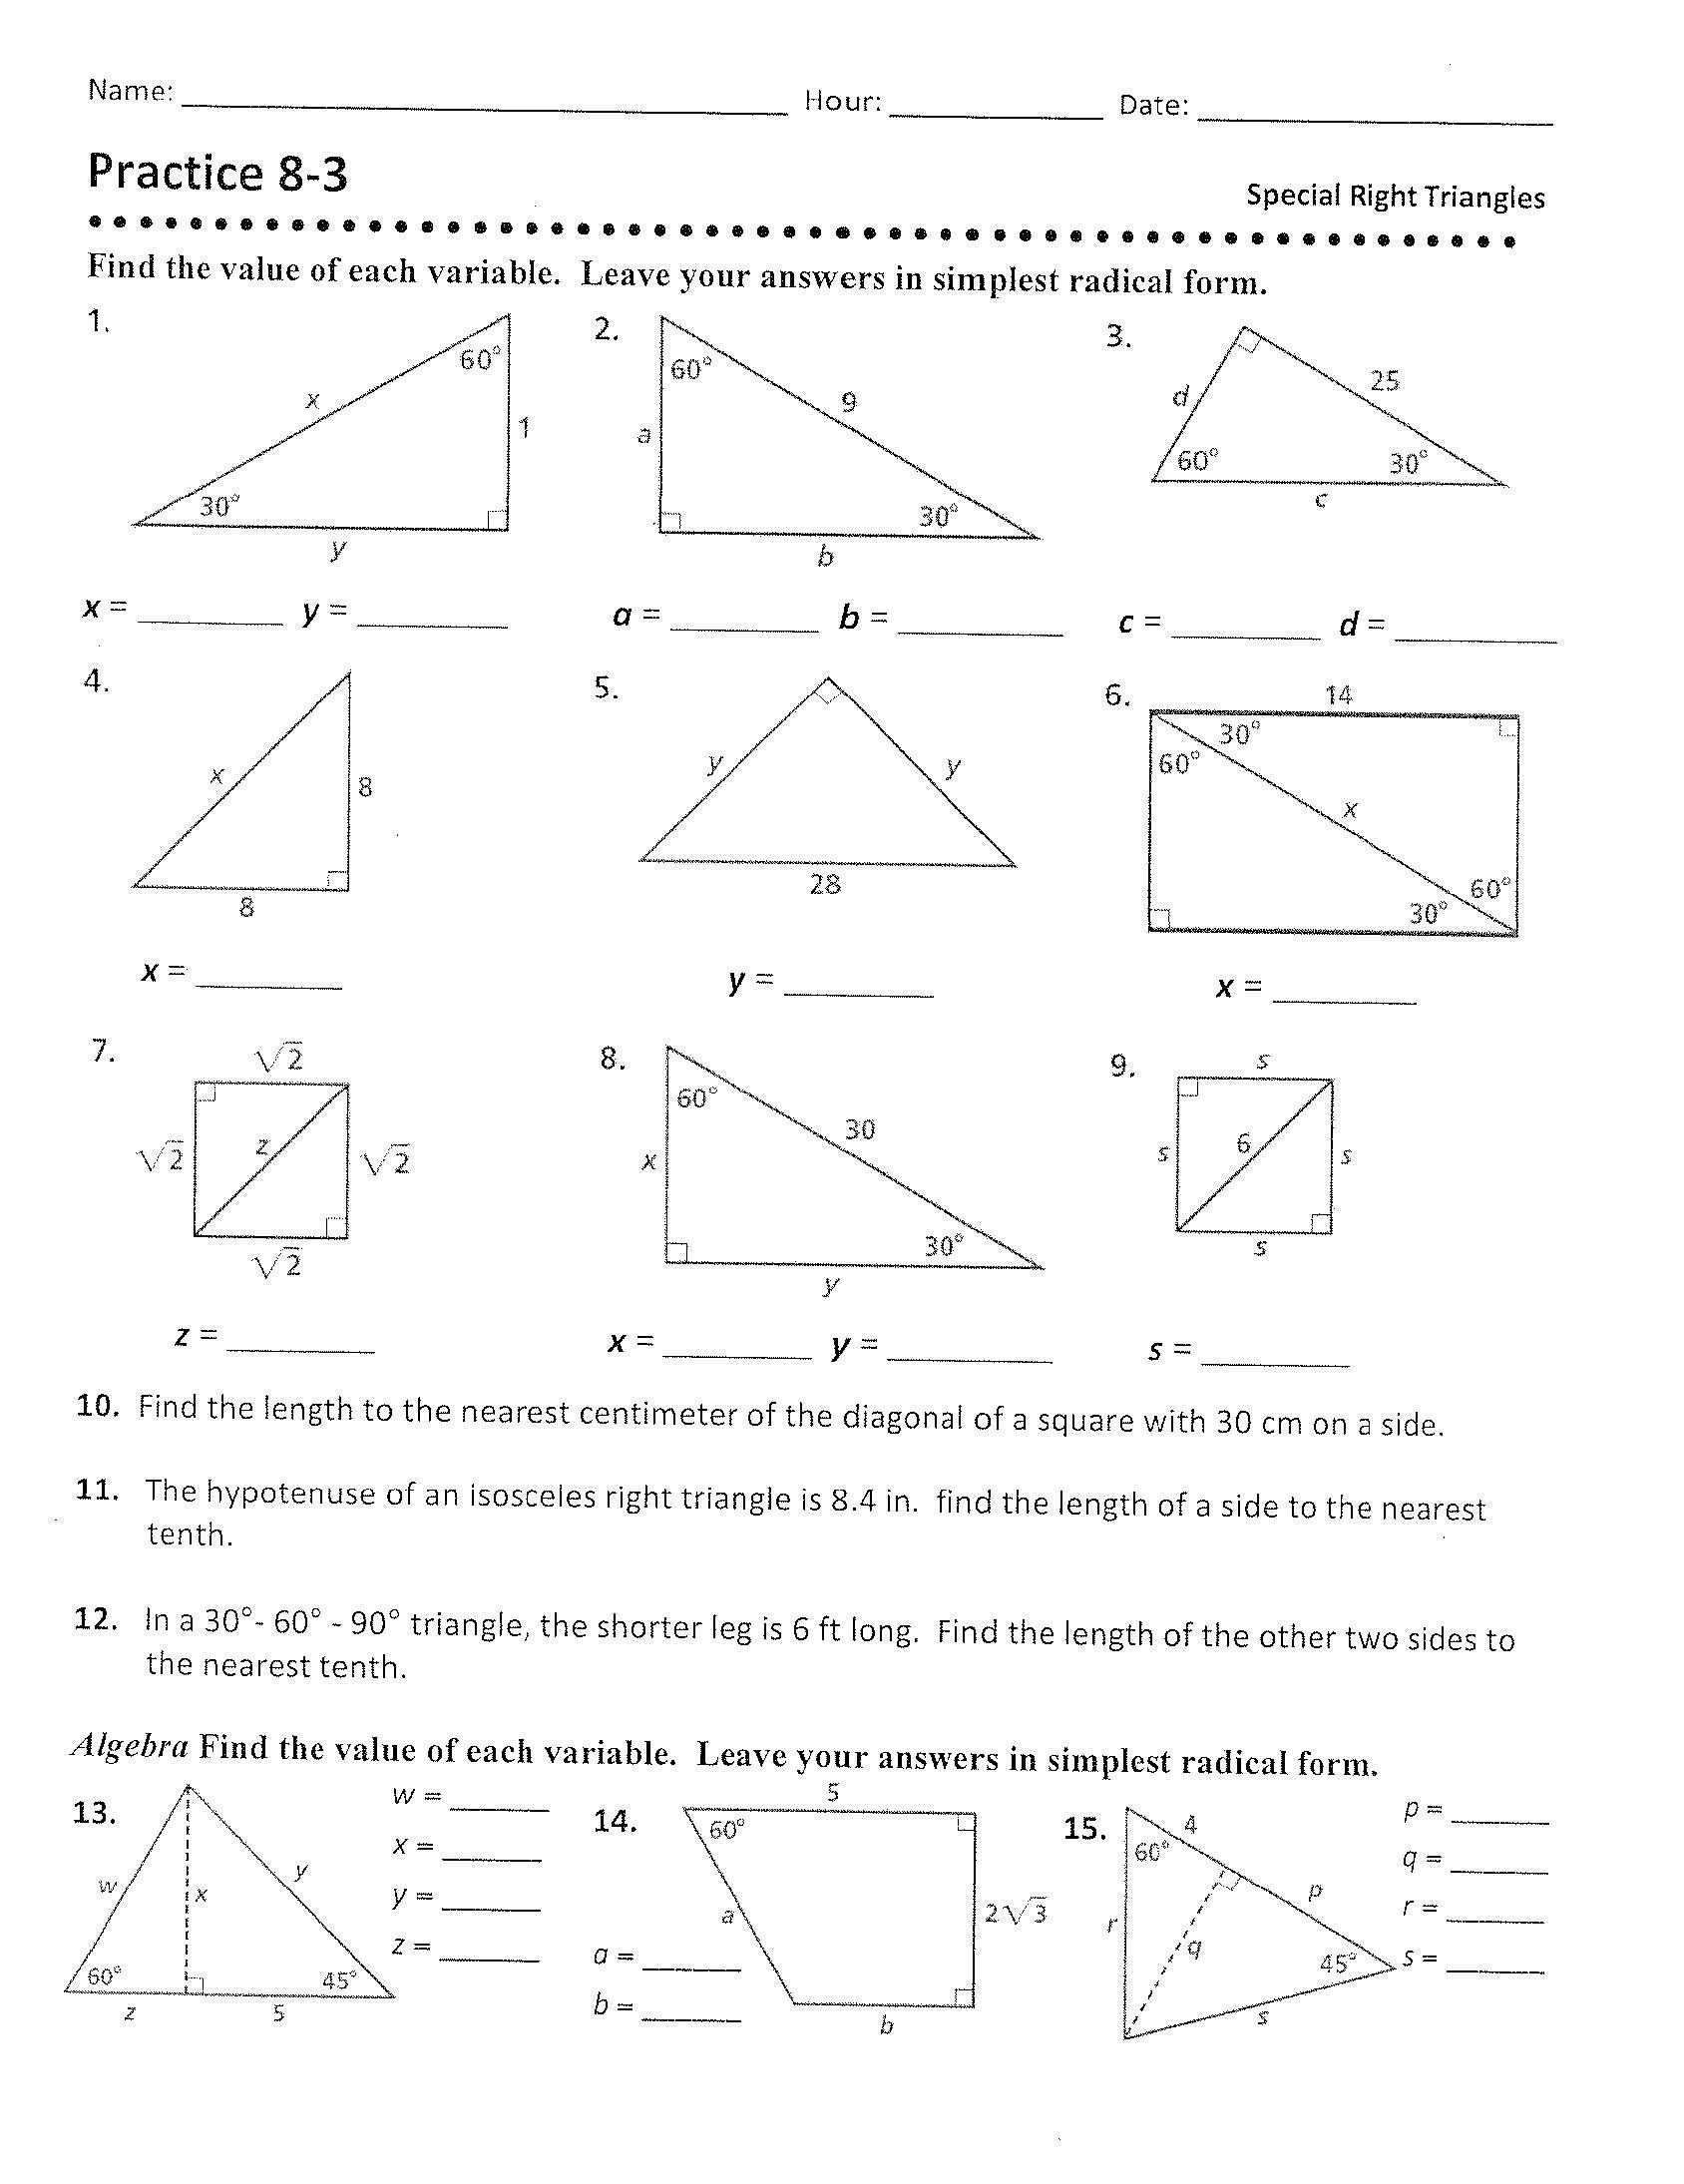 30 30 60 90 Triangles Worksheet